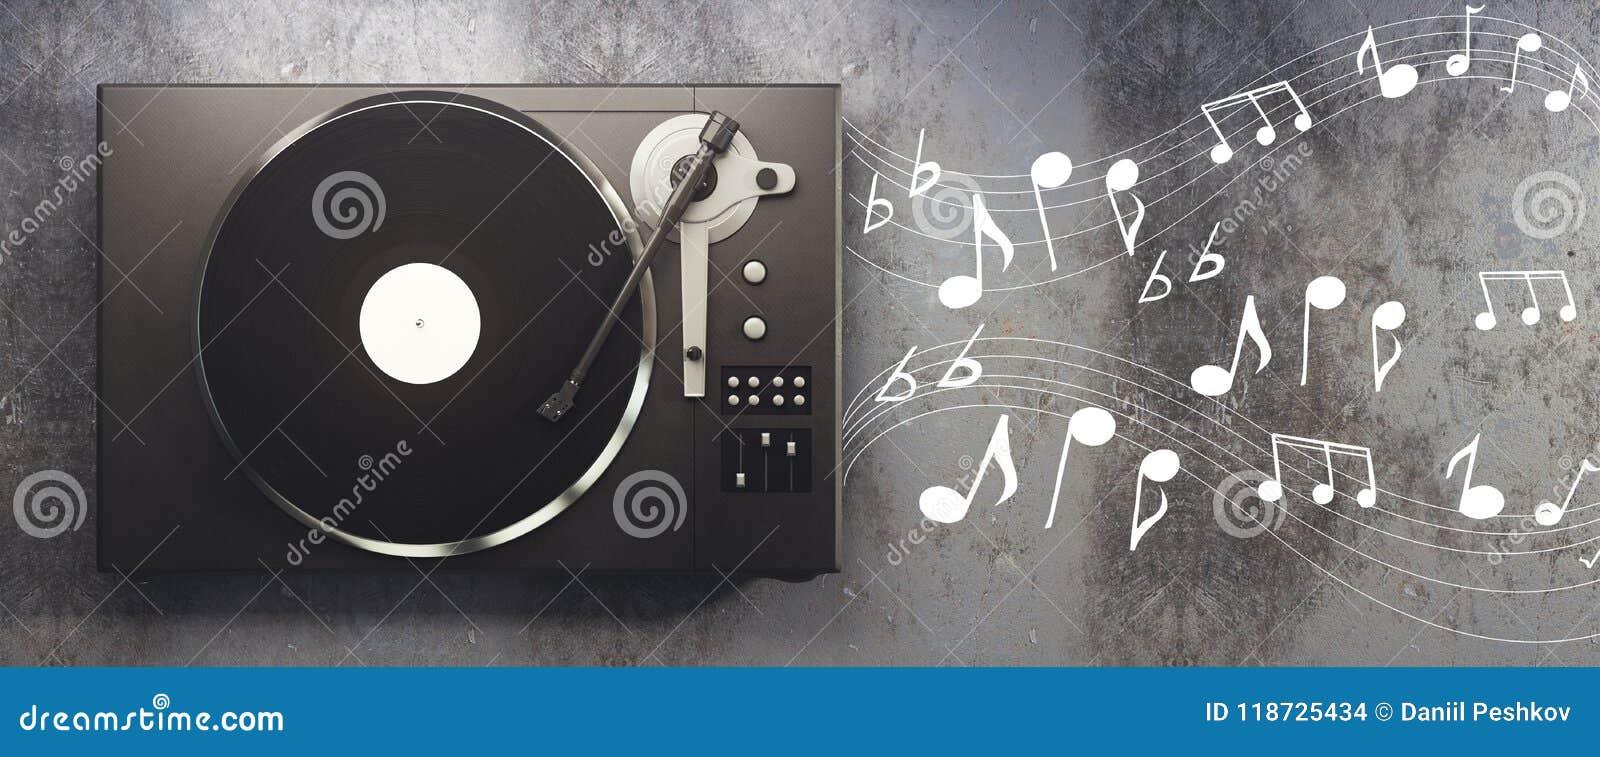 Vinyl Player On Concrete Background Stock Illustration